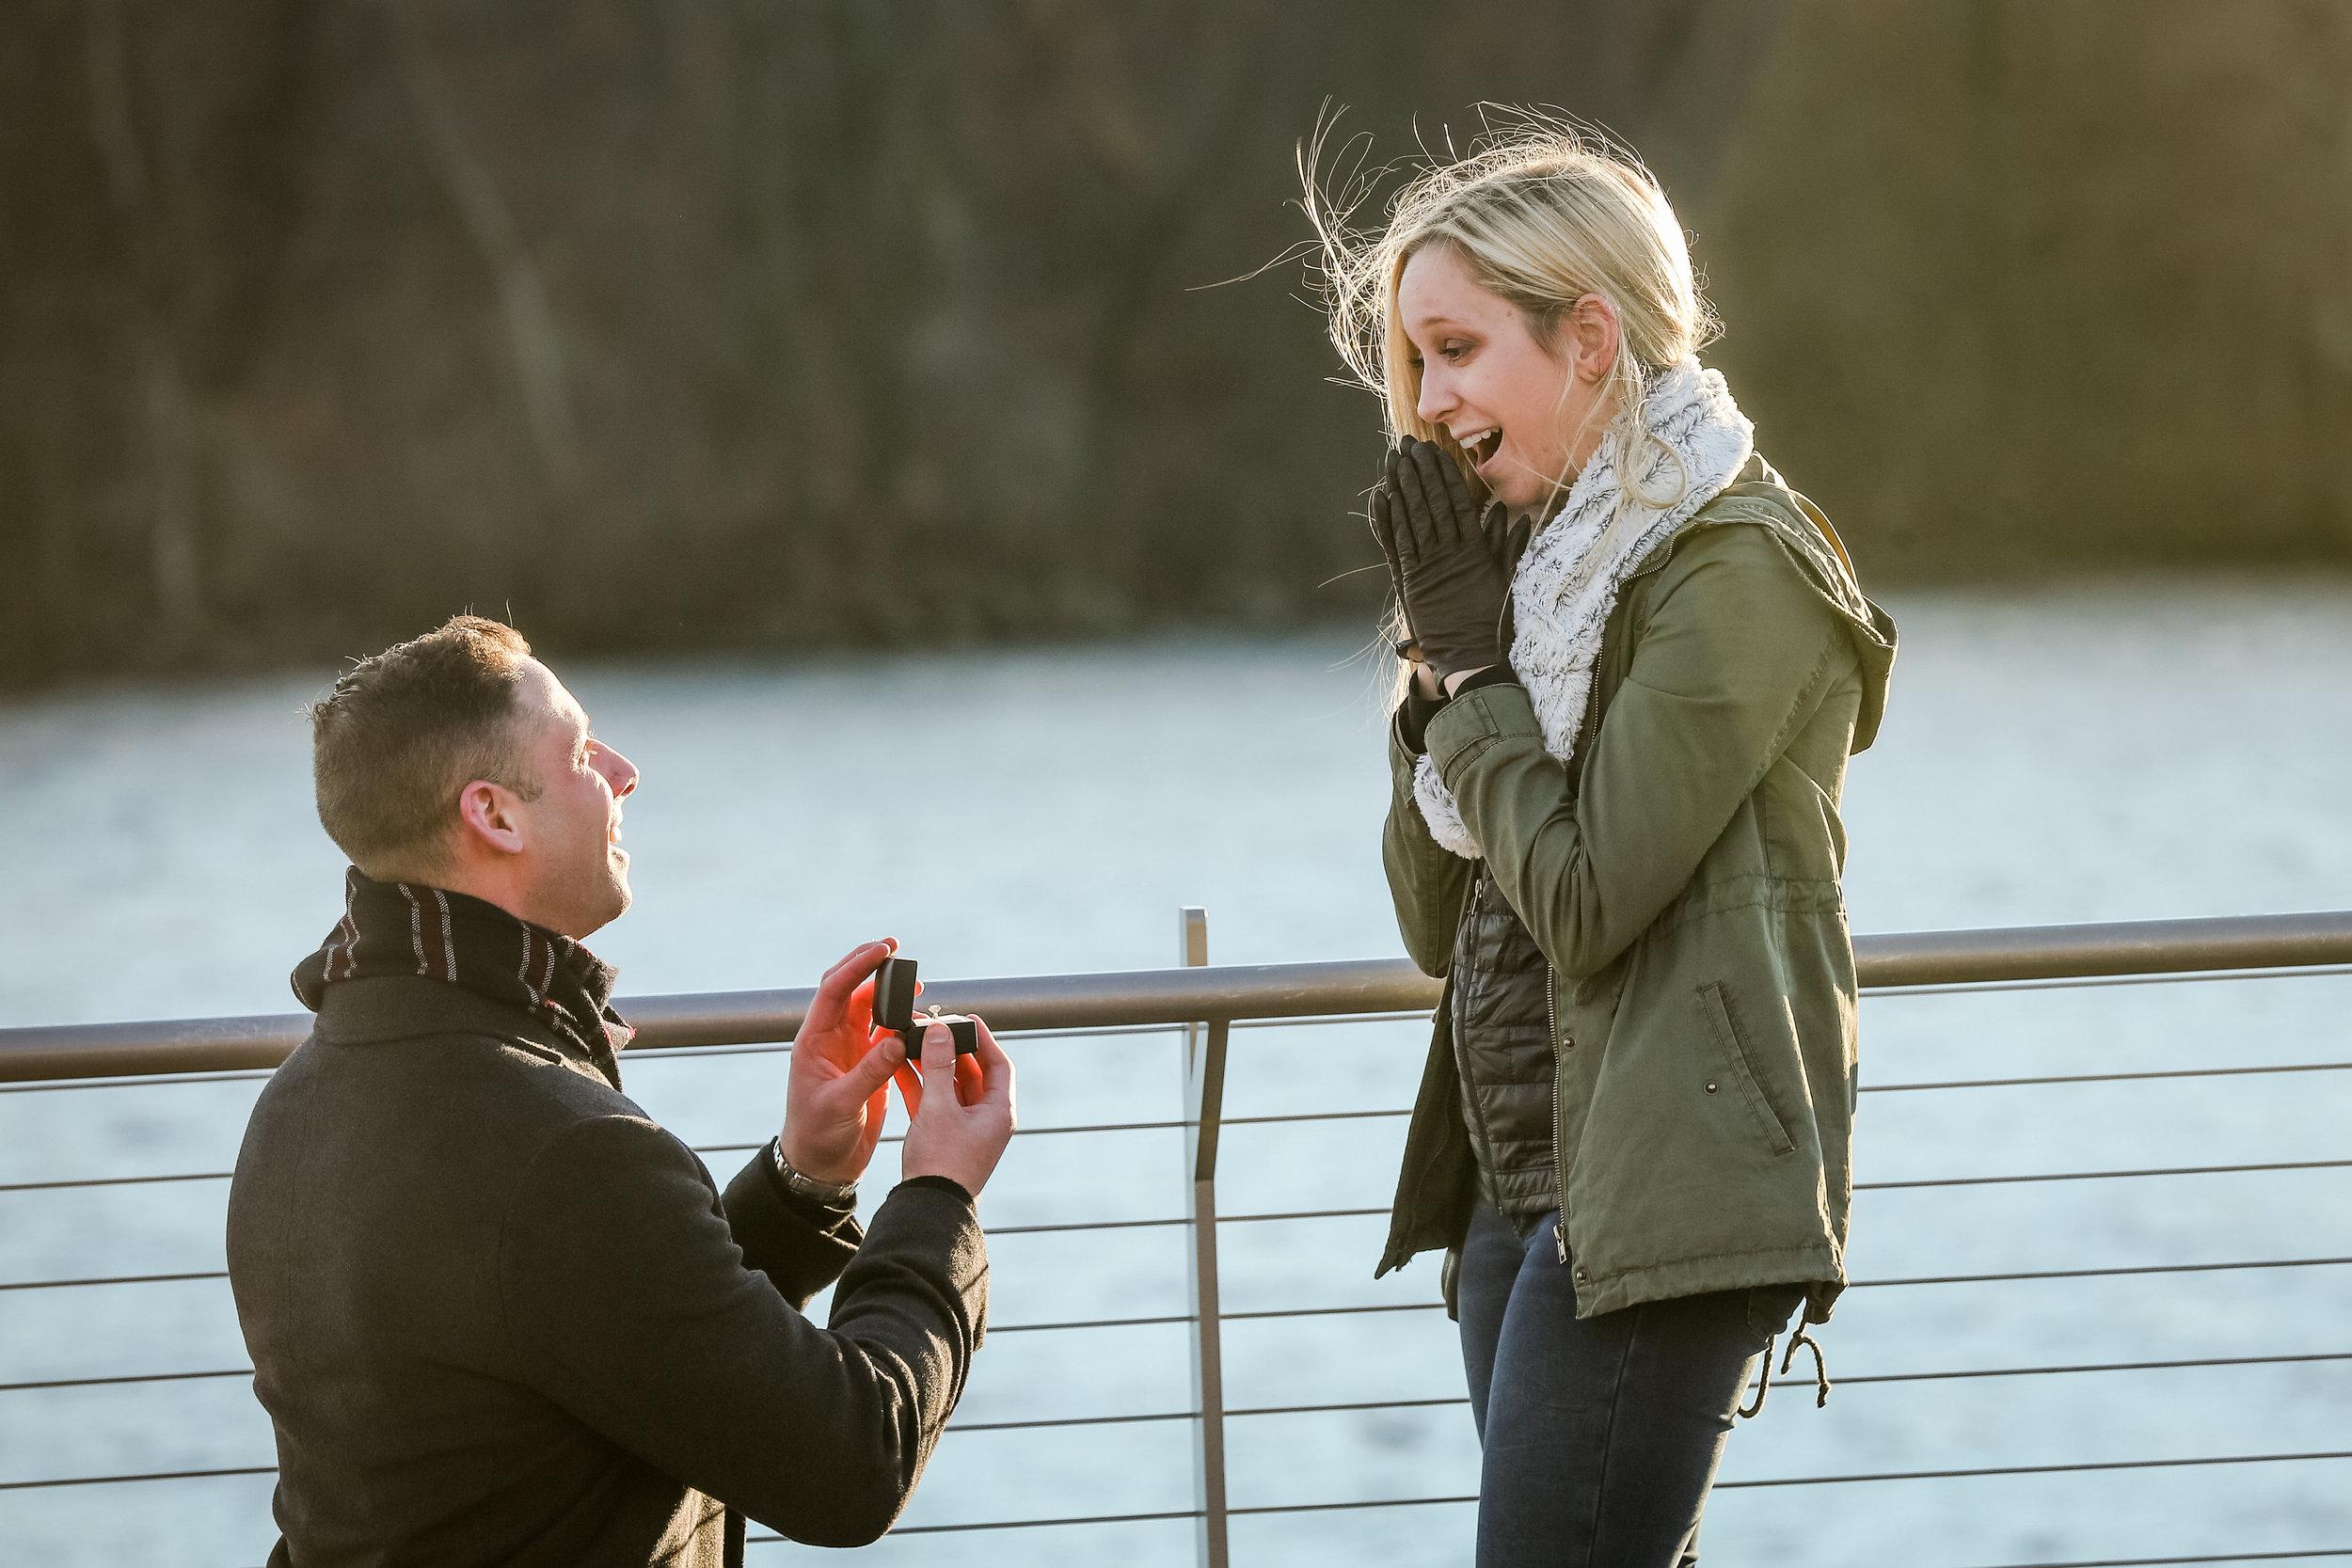 georgetown-washington-dc-surprise-proposal-photographer